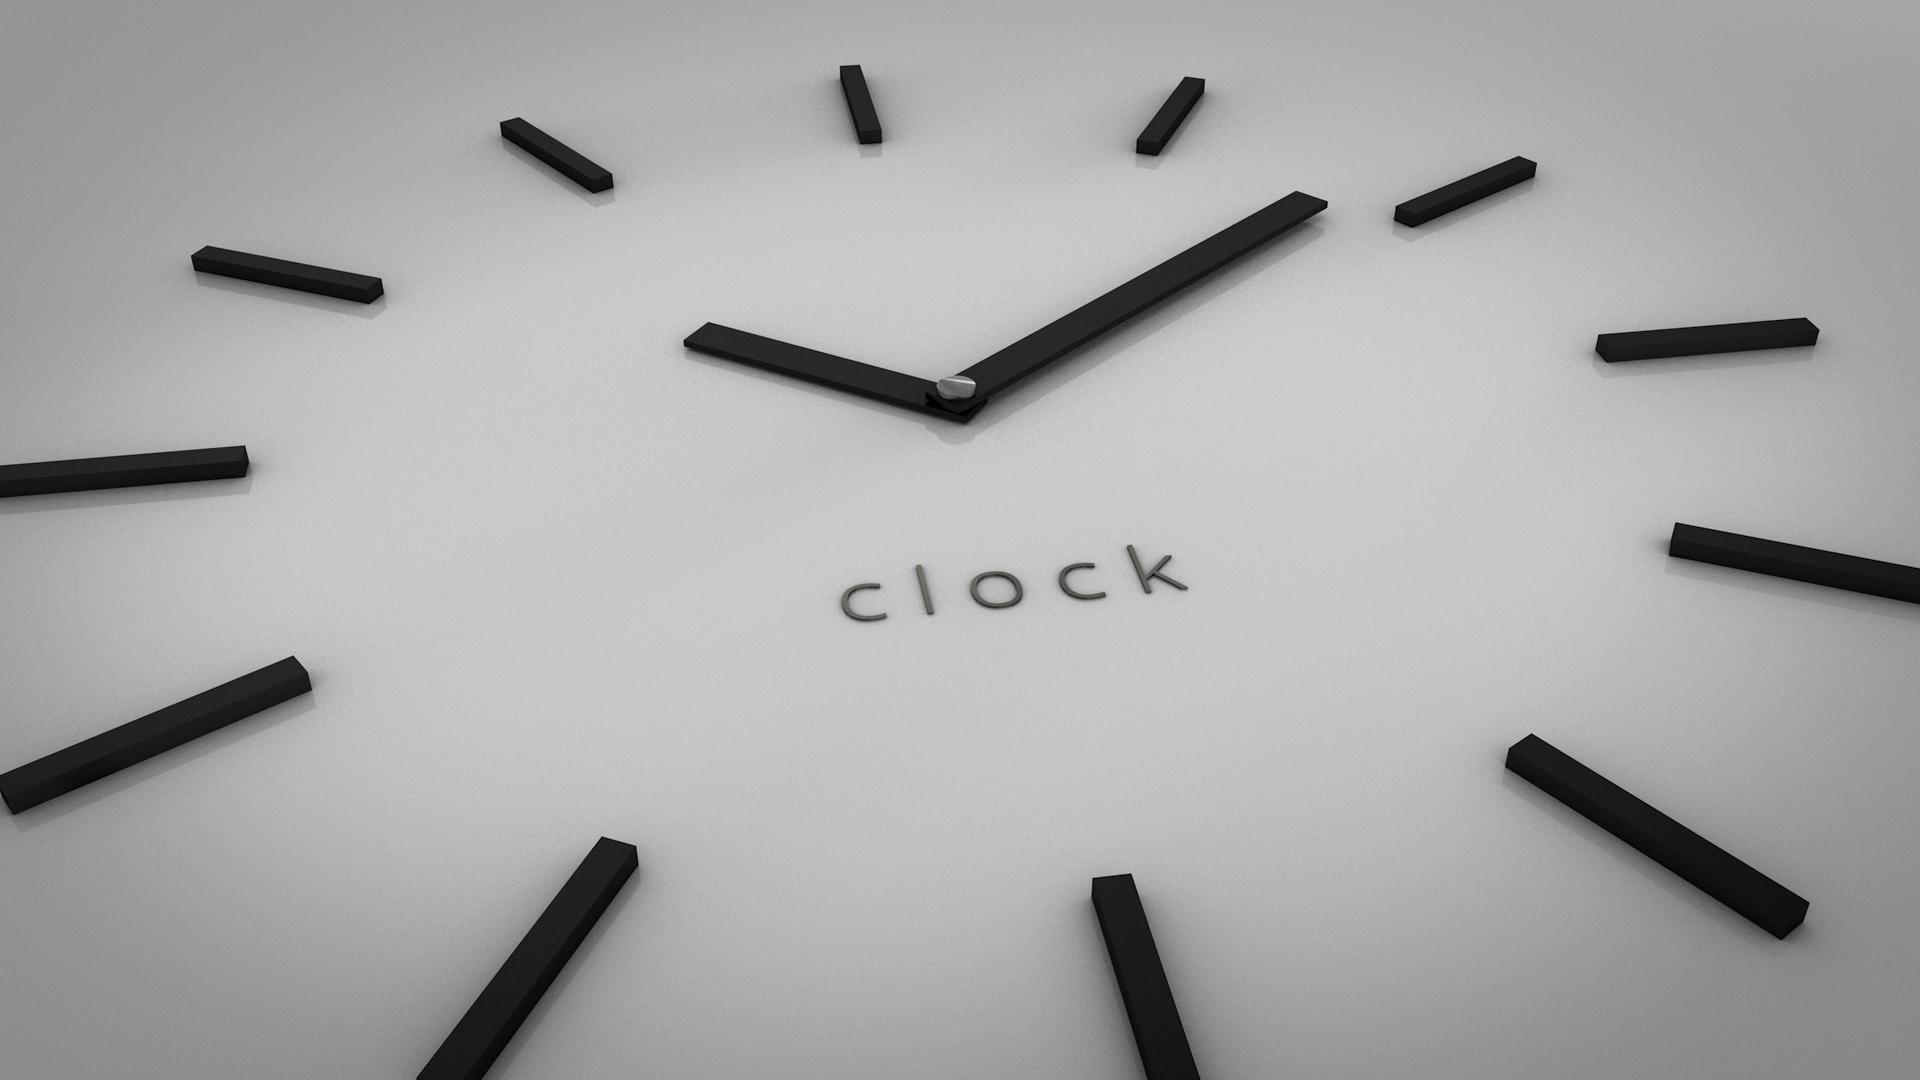 Minimalistic Clock Wallpaper by italankin on DeviantArt